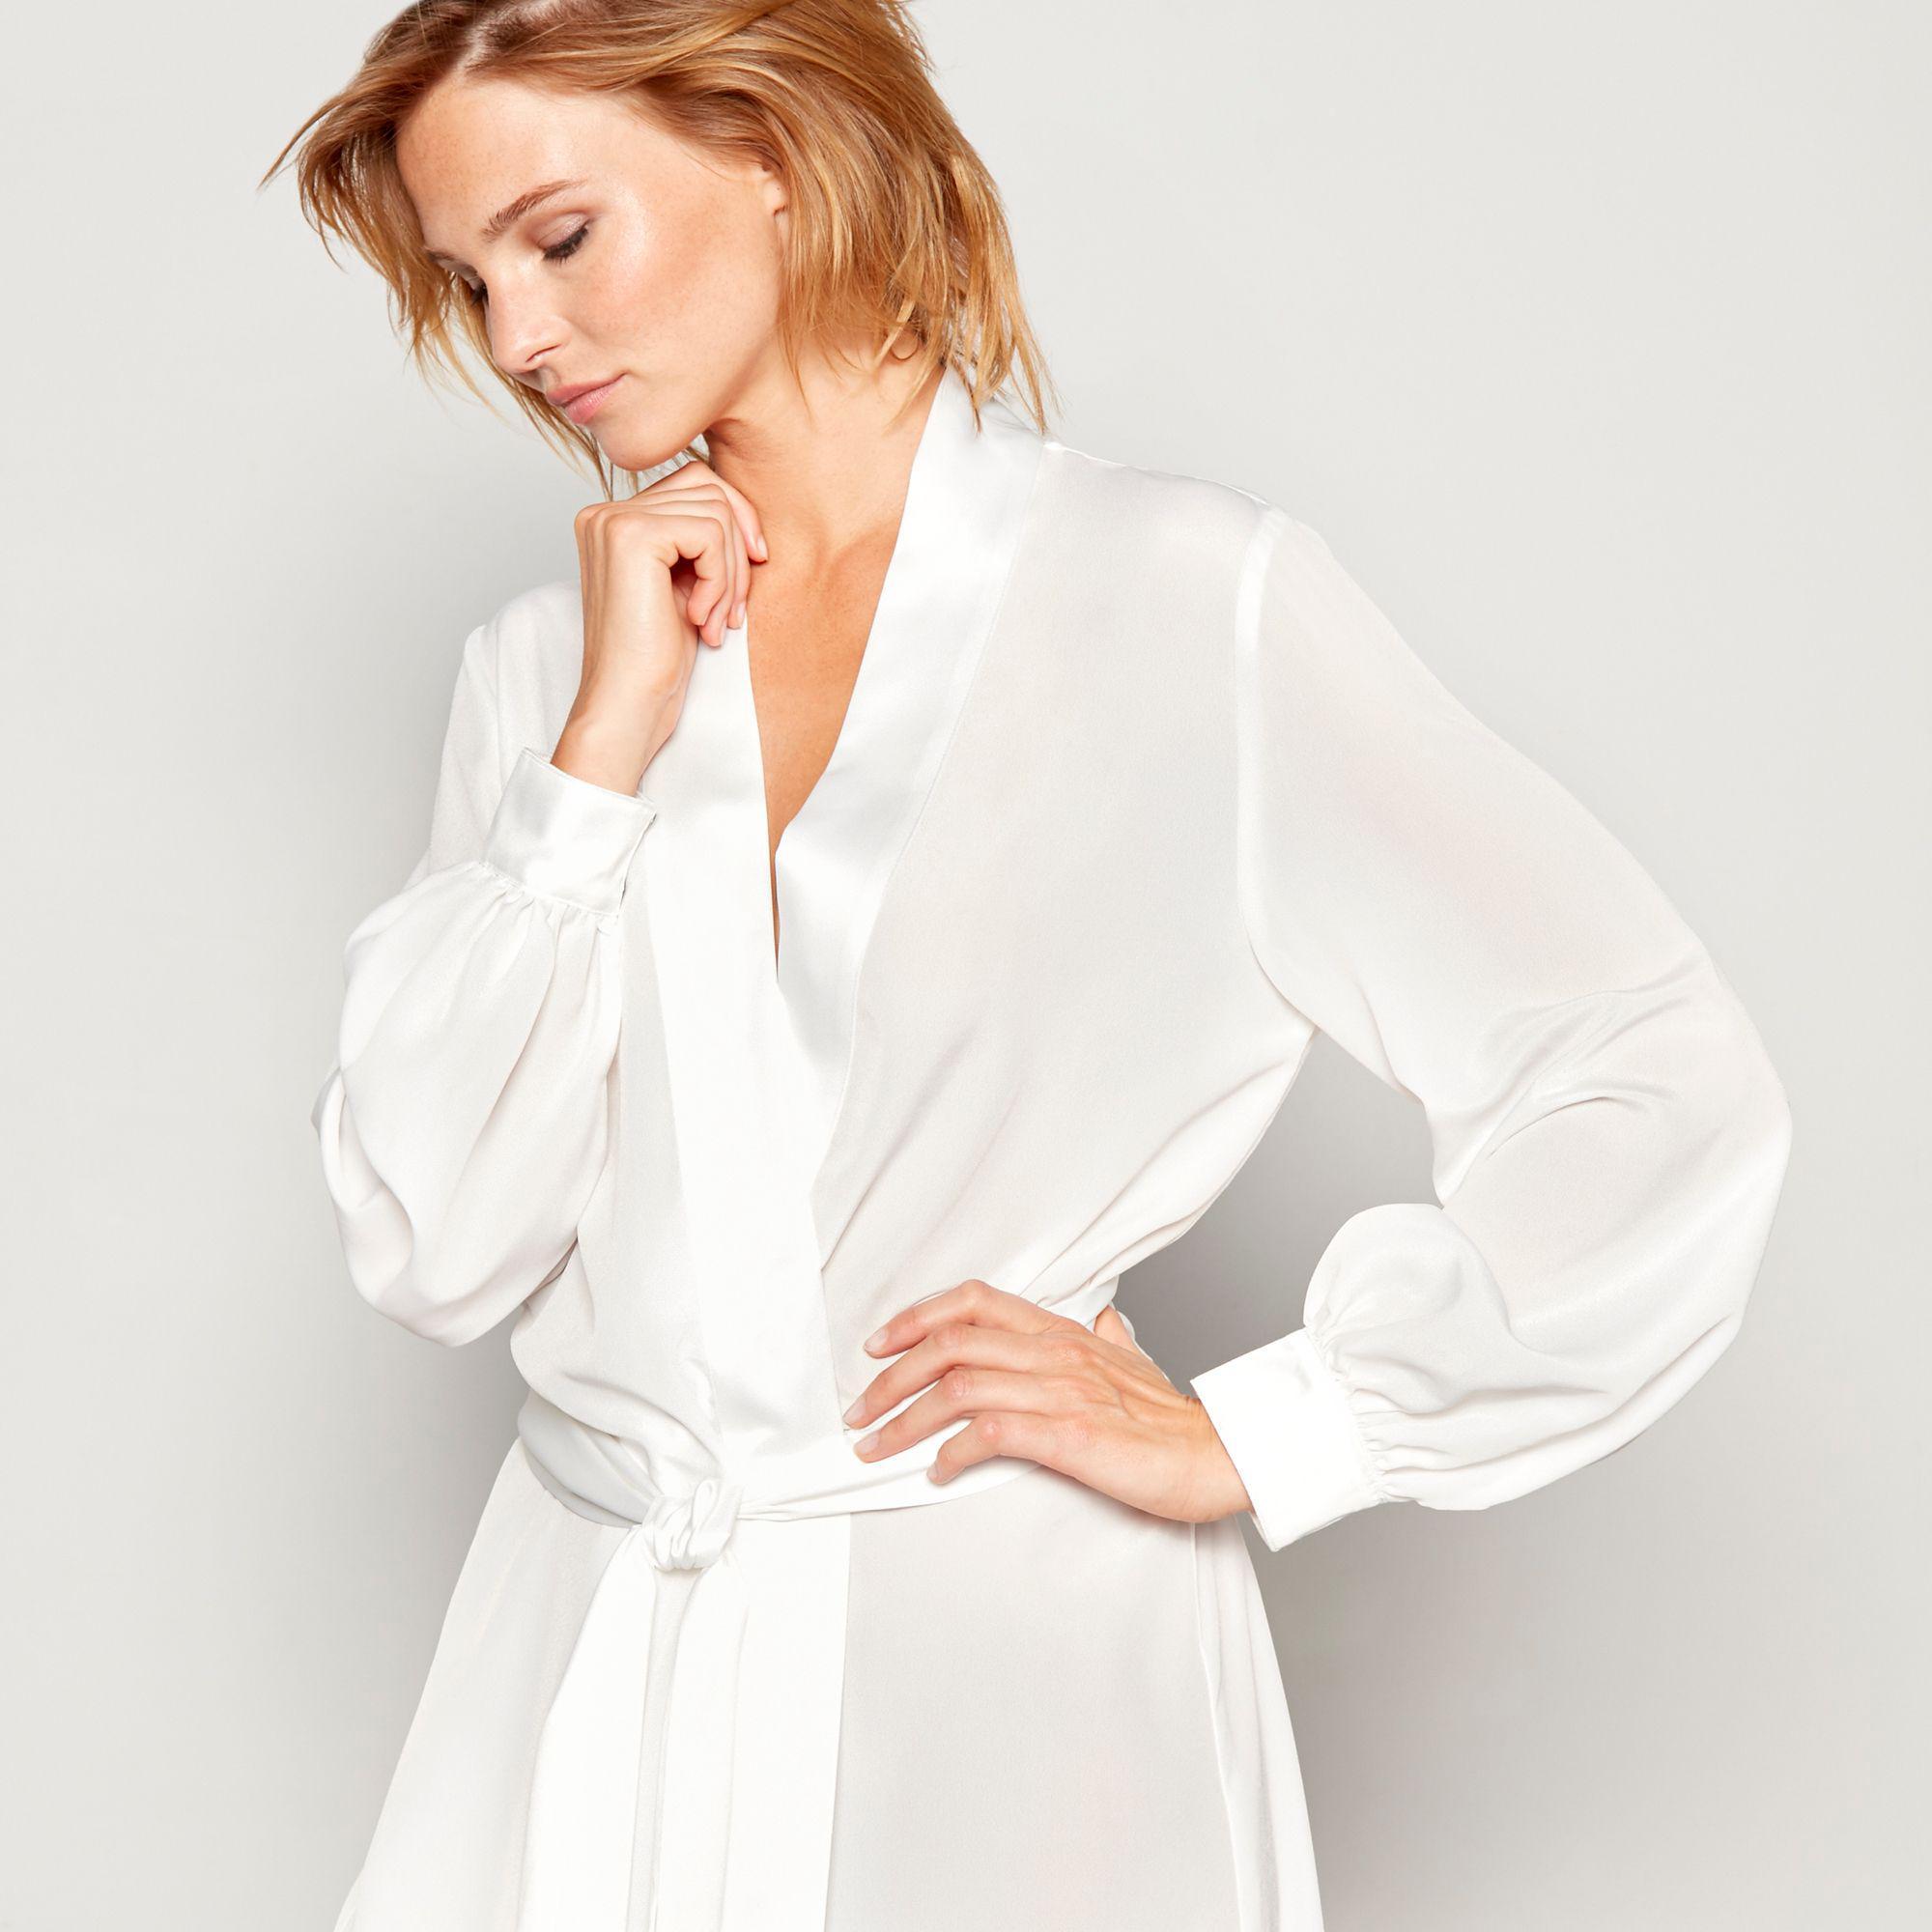 940f27f763 ... White Ivory Bridal Chiffon Satin Dressing Gown - Lyst. View fullscreen